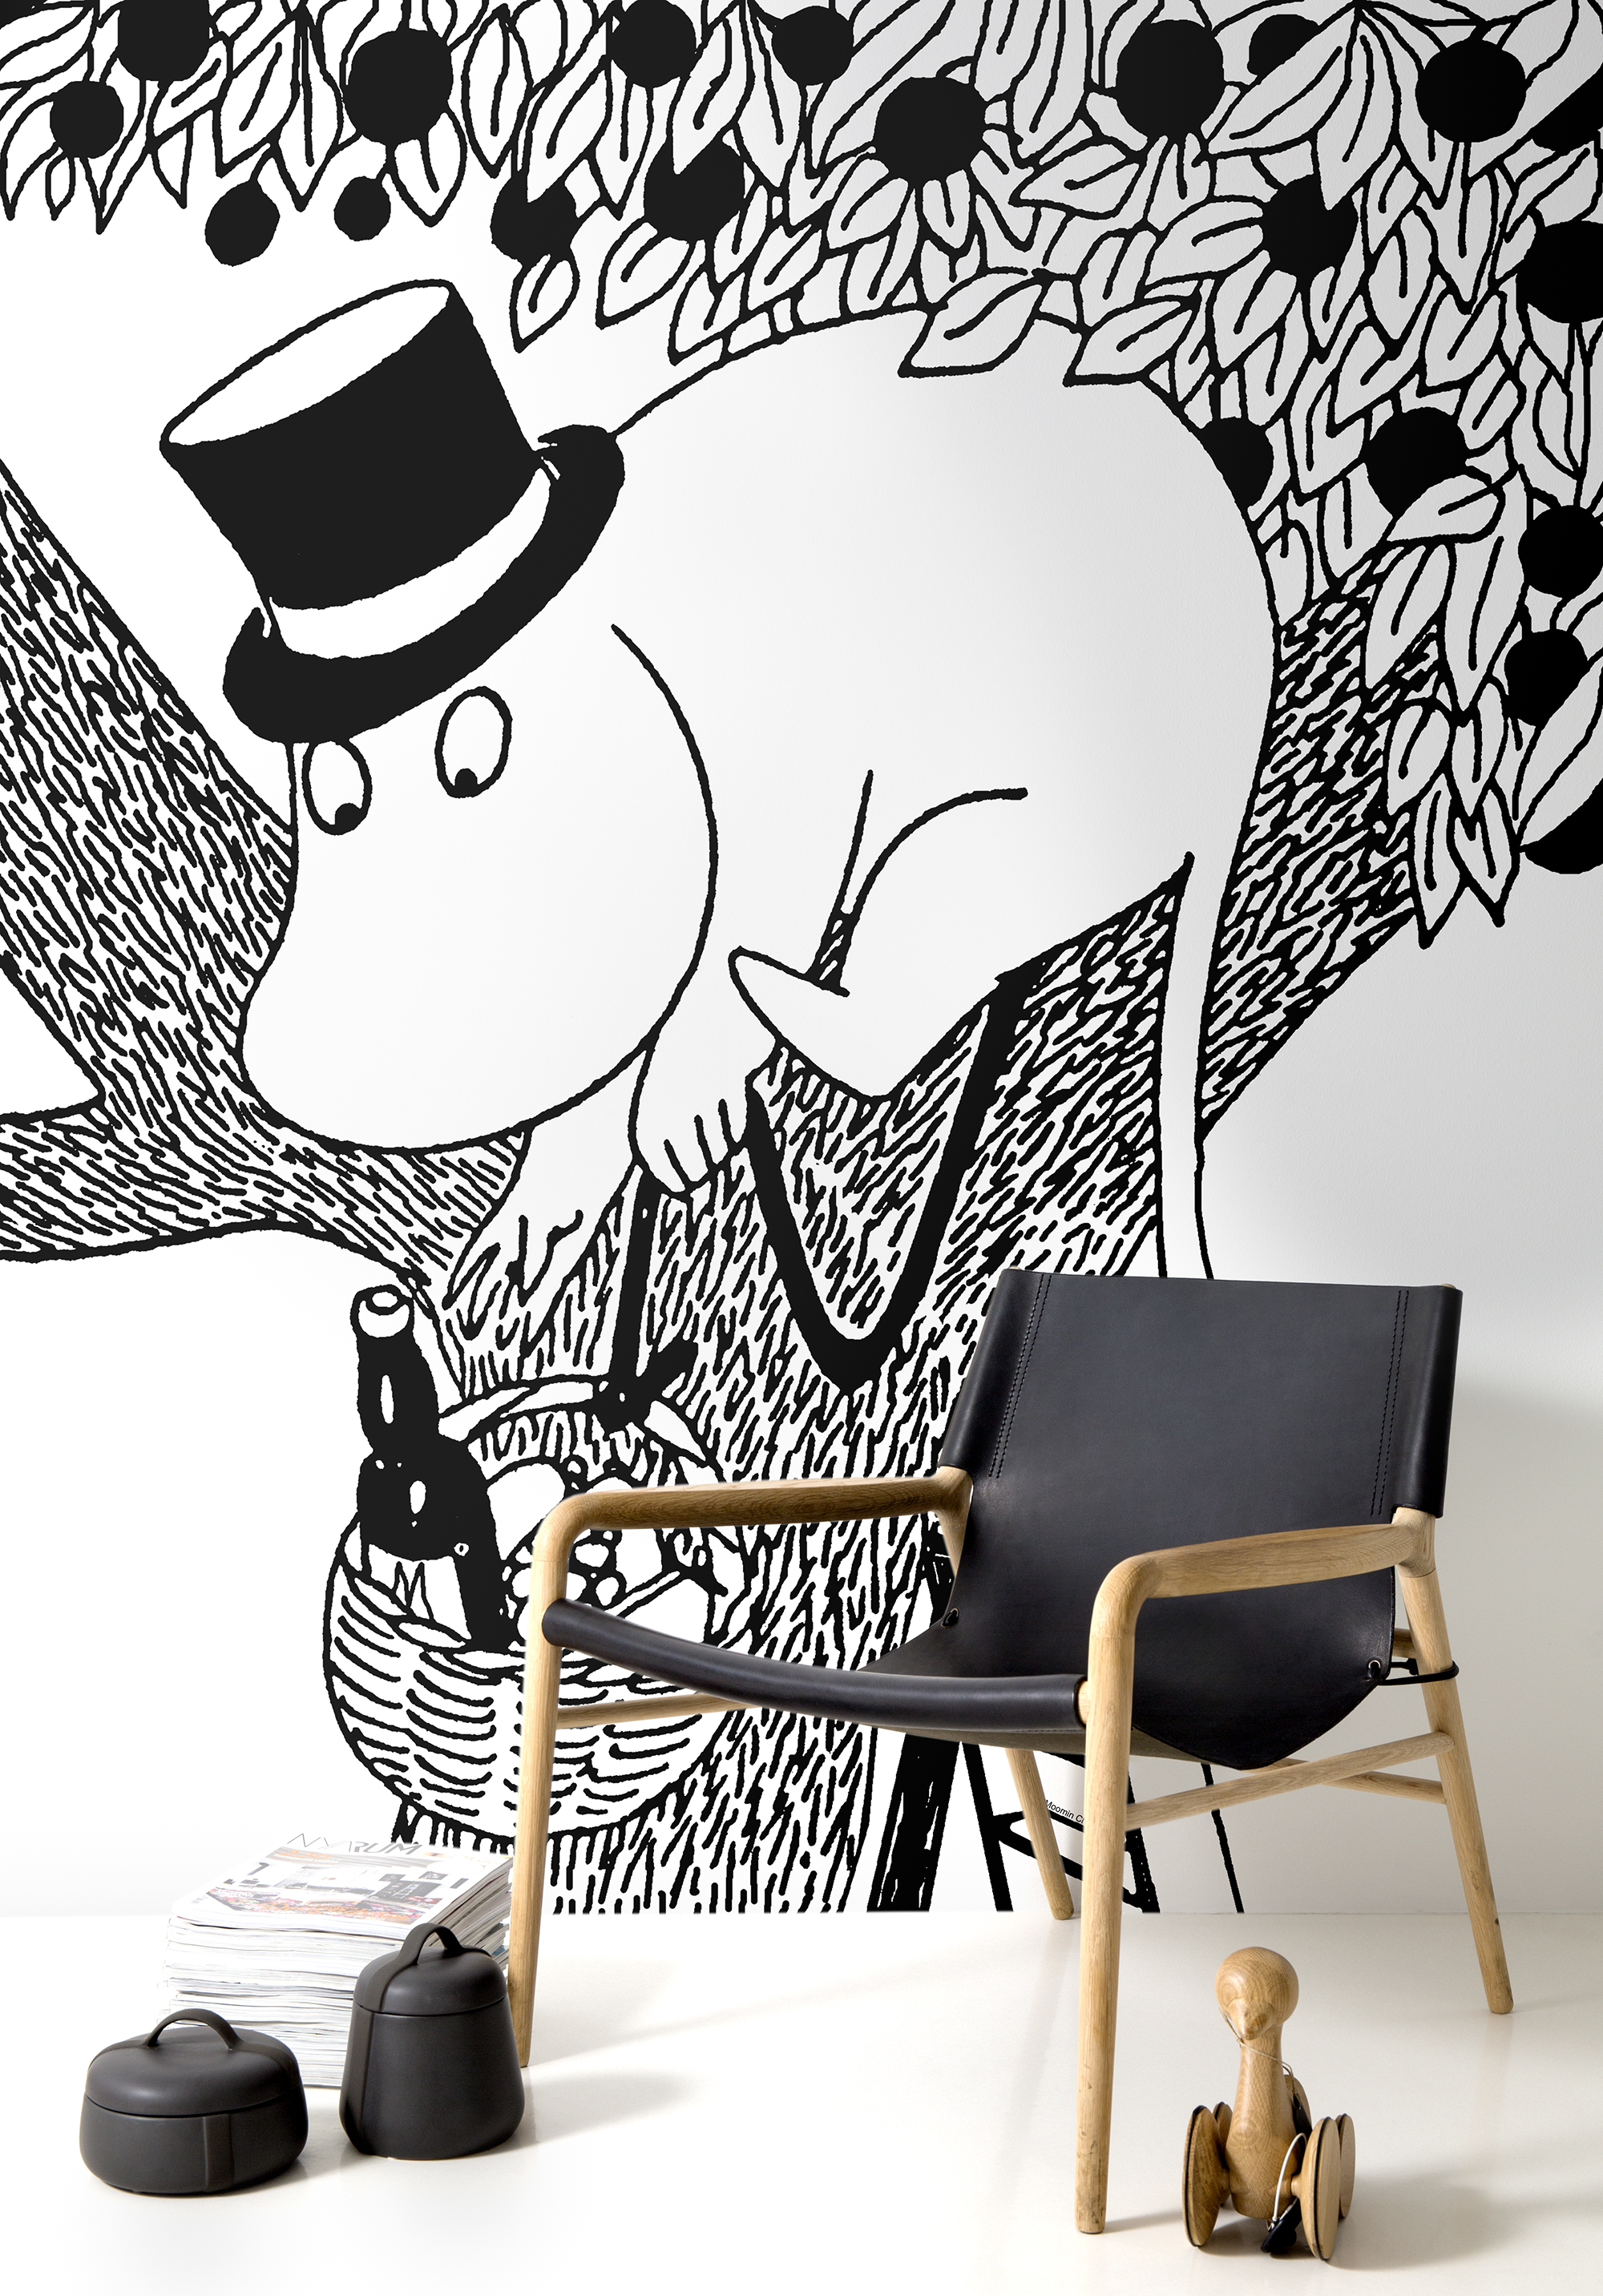 Photowall - Moominpappa the Epicurean